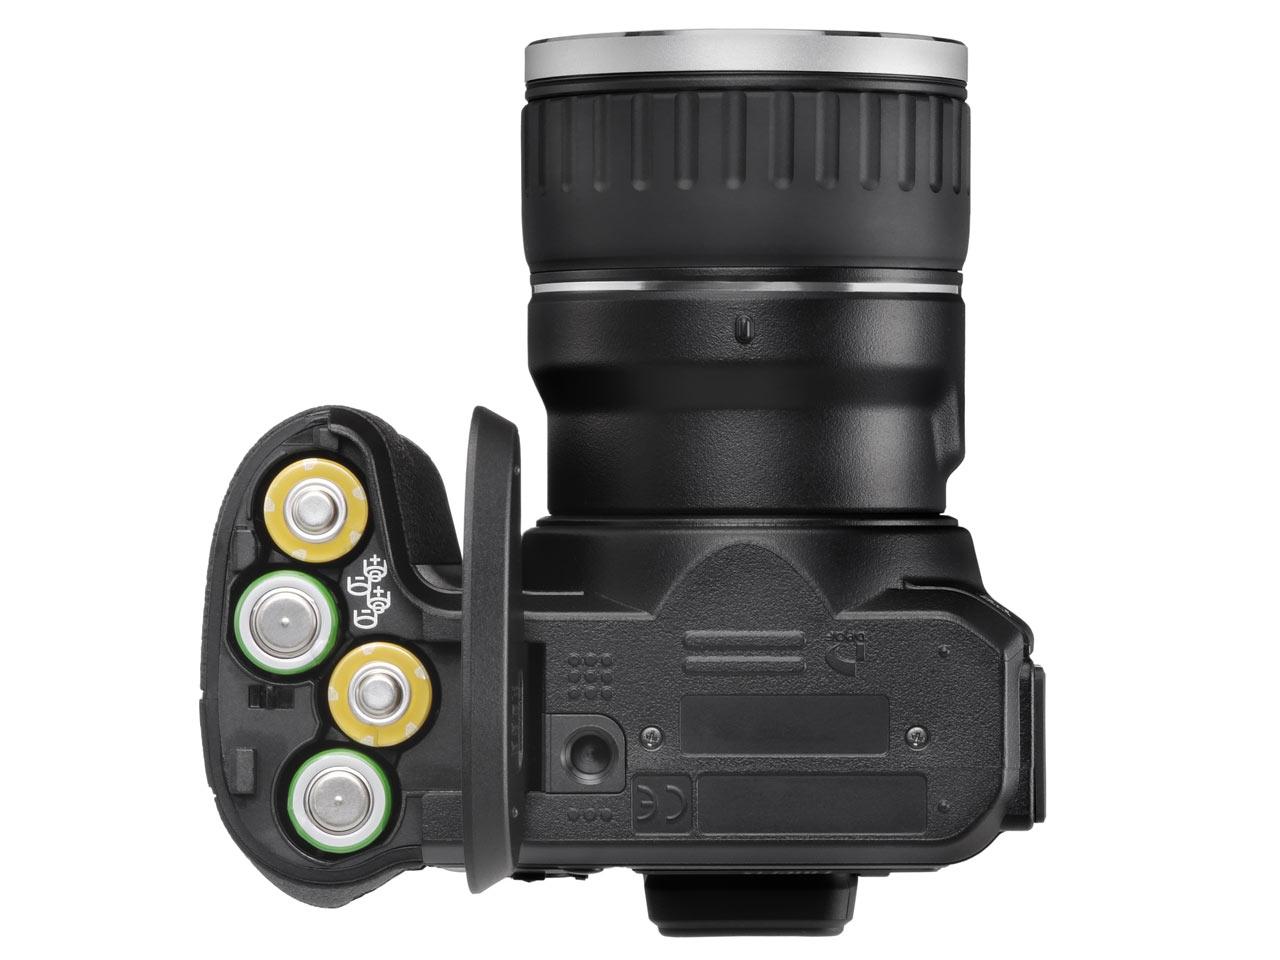 Fujifilm FinePix S5200 Zoom .